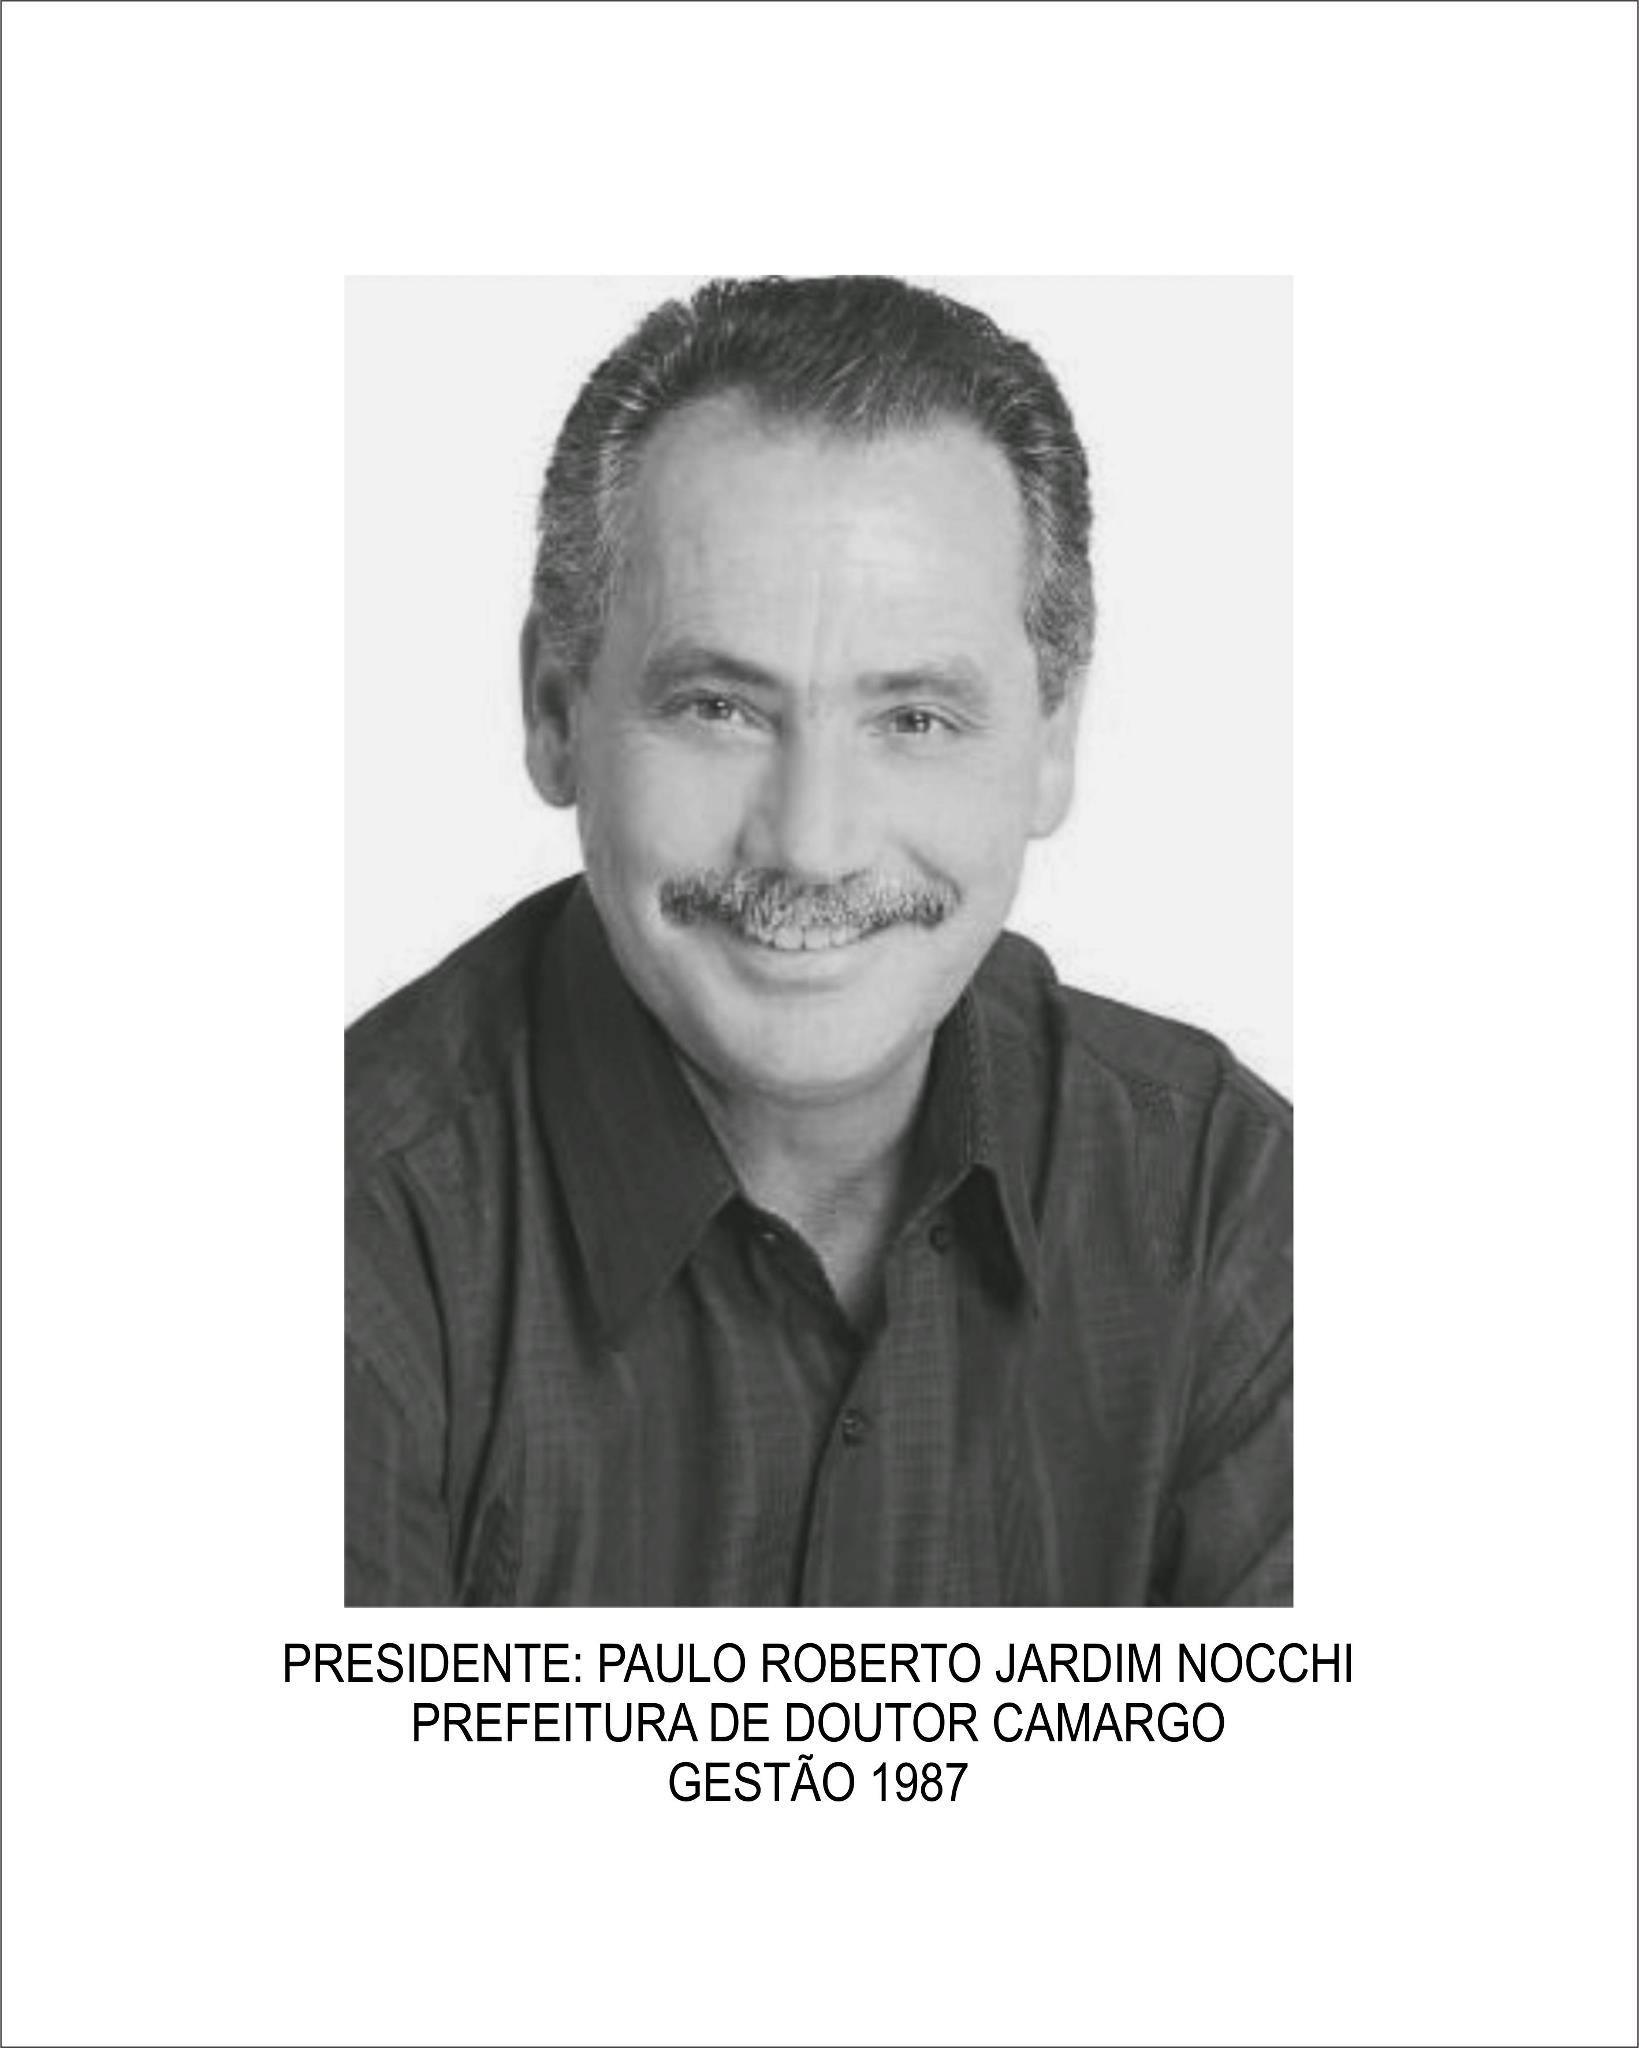 Paulo Roberto Jardim Nocchi